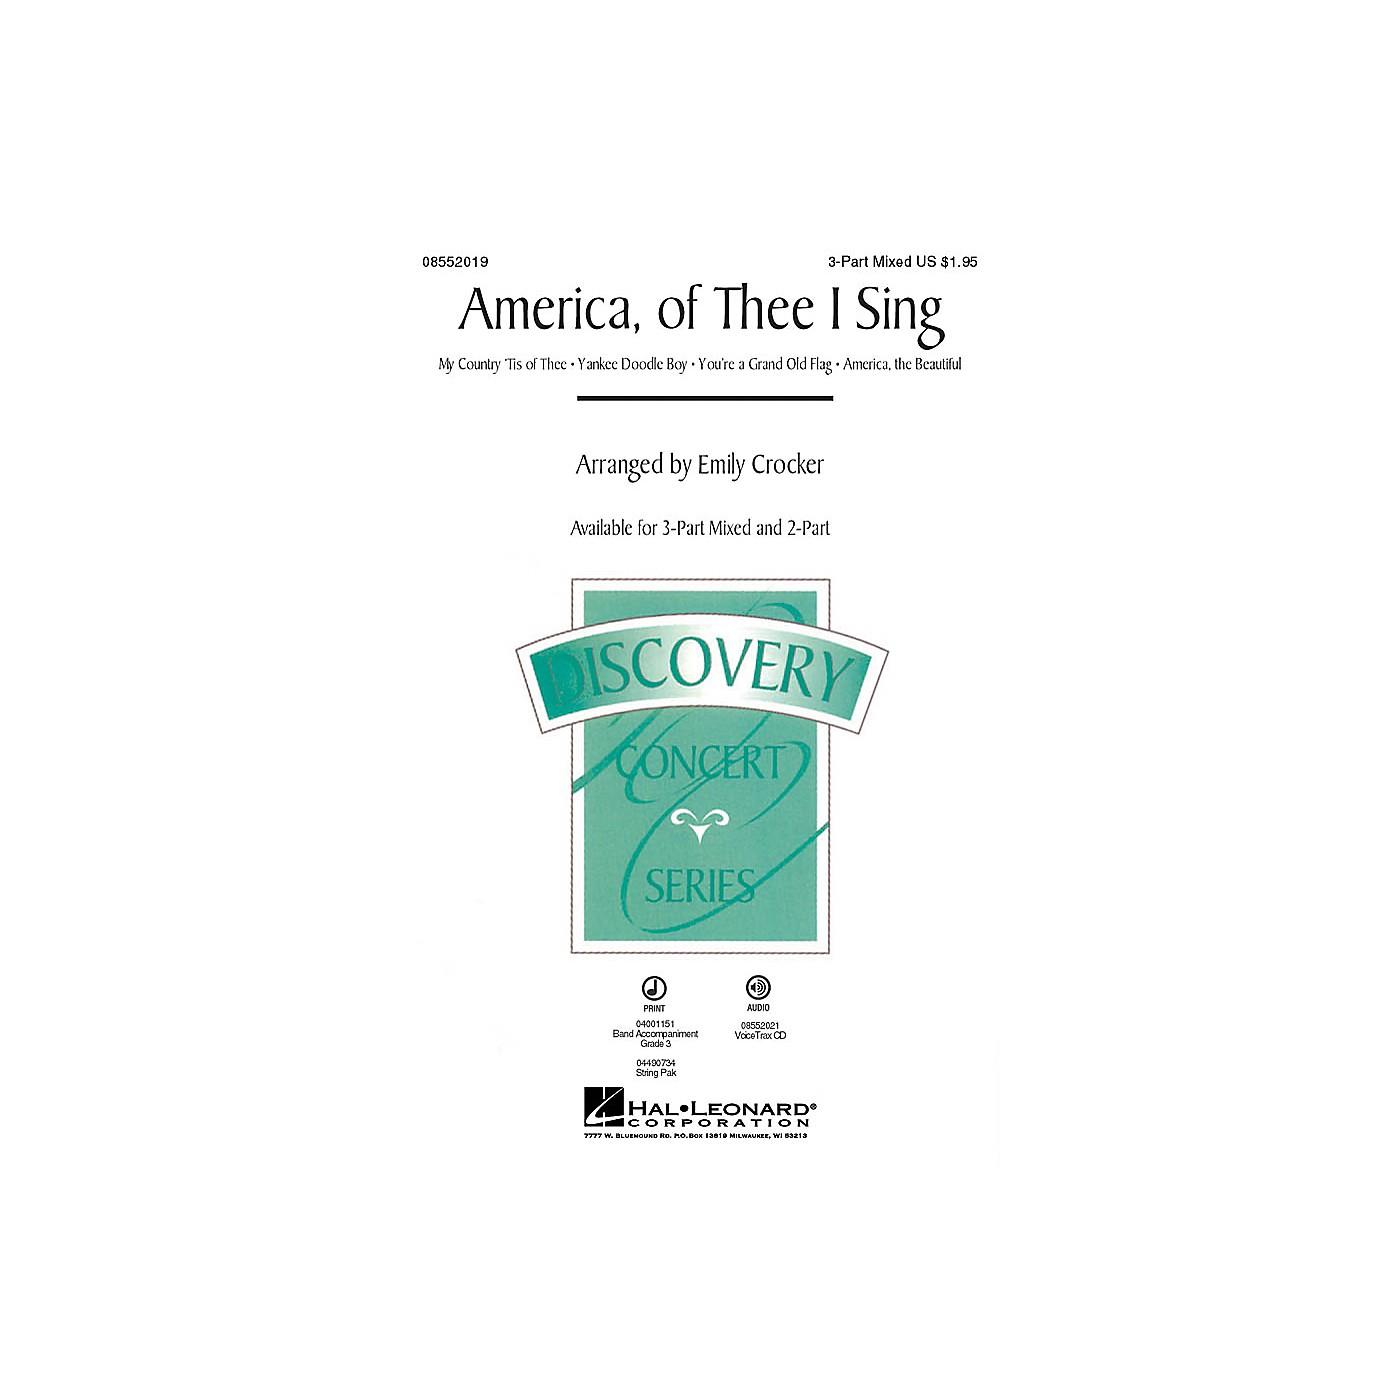 Hal Leonard America, of Thee I Sing (Medley) VoiceTrax CD Arranged by Emily Crocker thumbnail